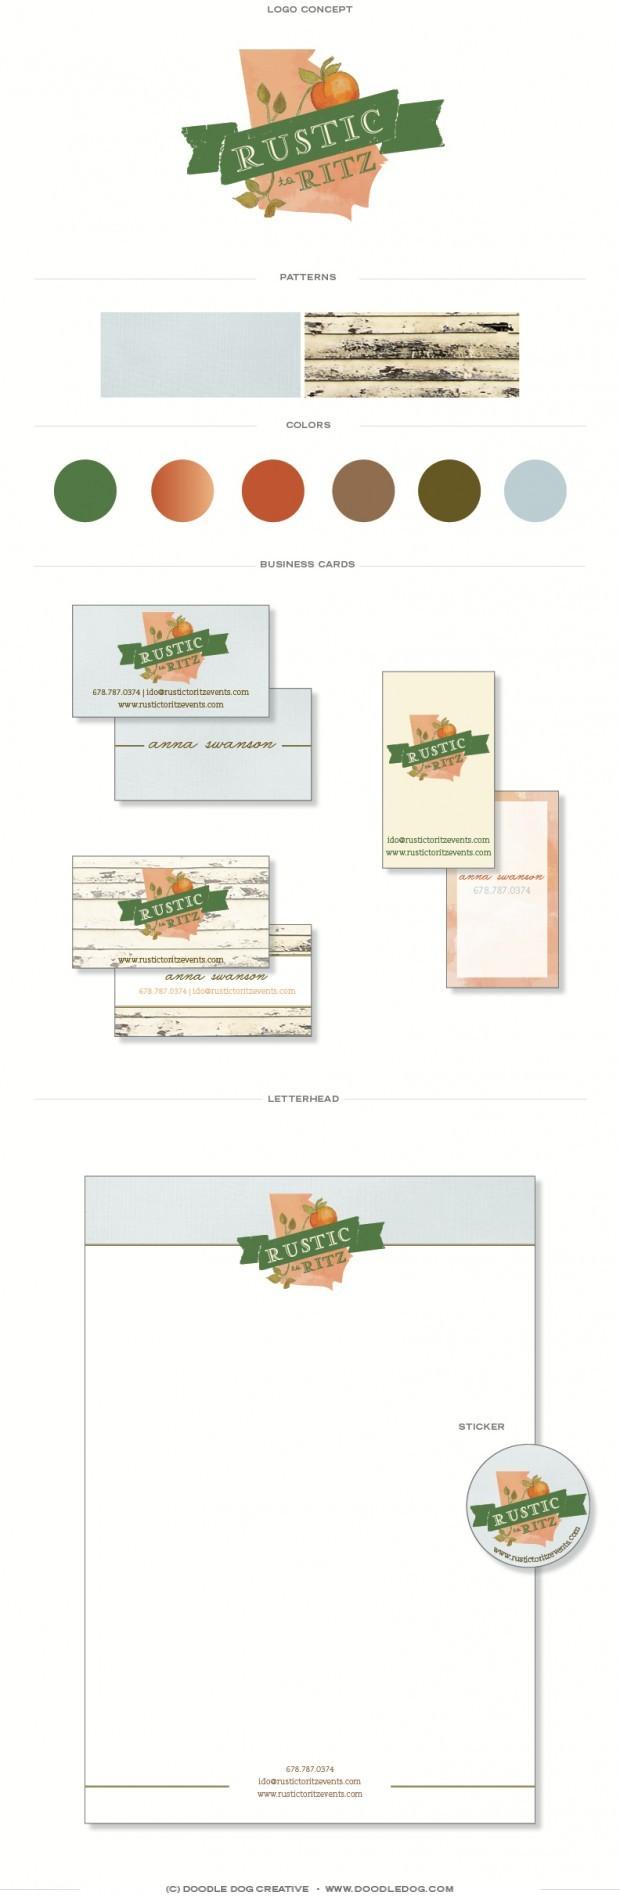 wedding planner branding, logo design for wedding planner, rustic brand identity, southern brand identity, graphic designer